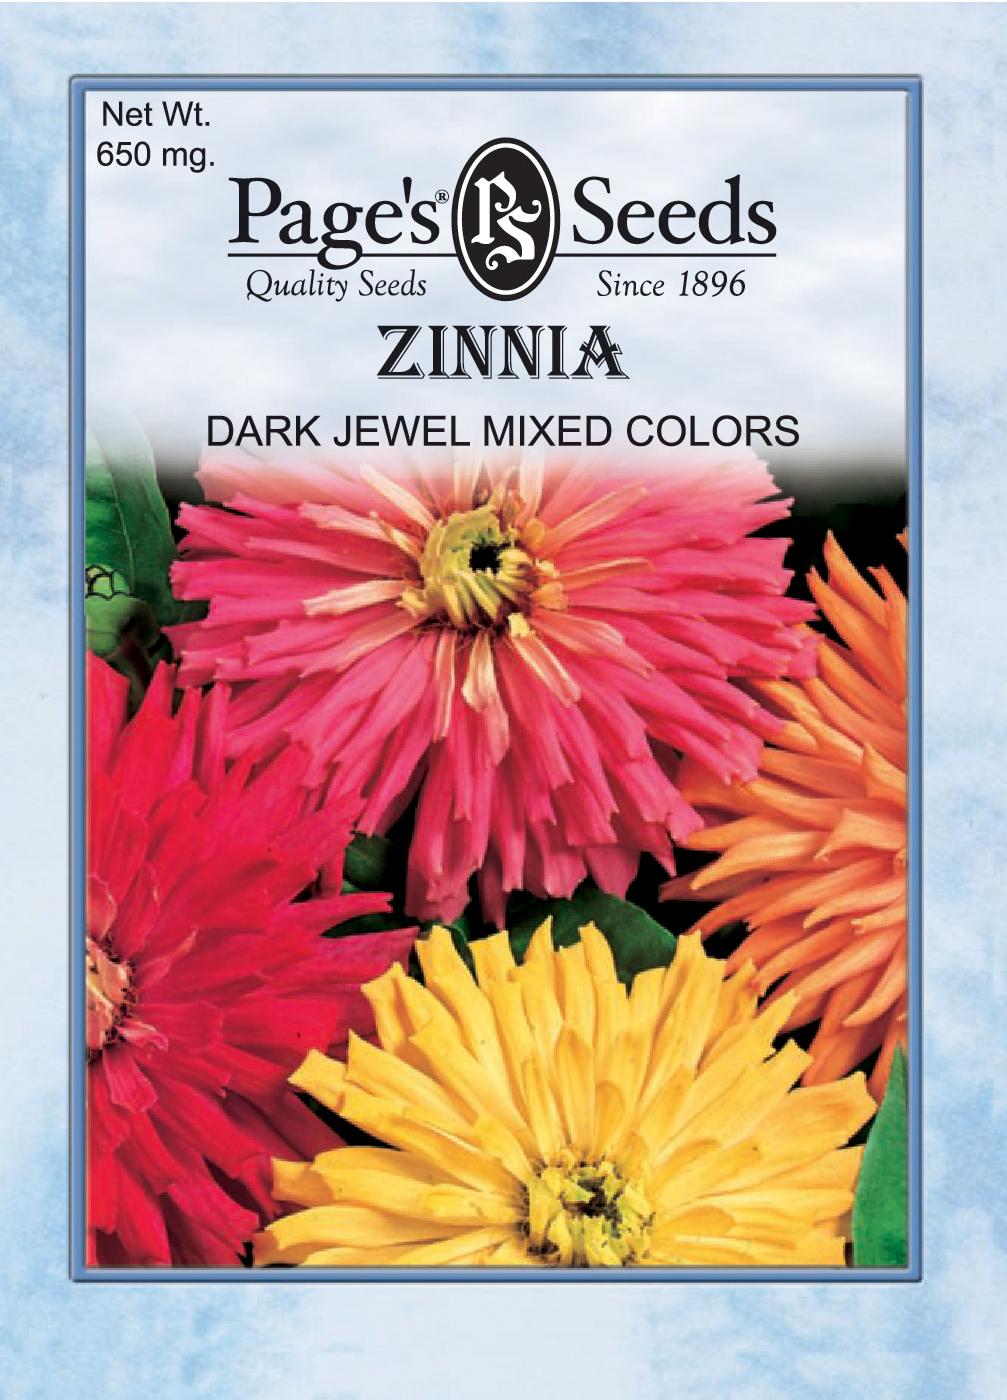 Zinnia, Dark Jewel Mix | The Page Seed Company, Inc